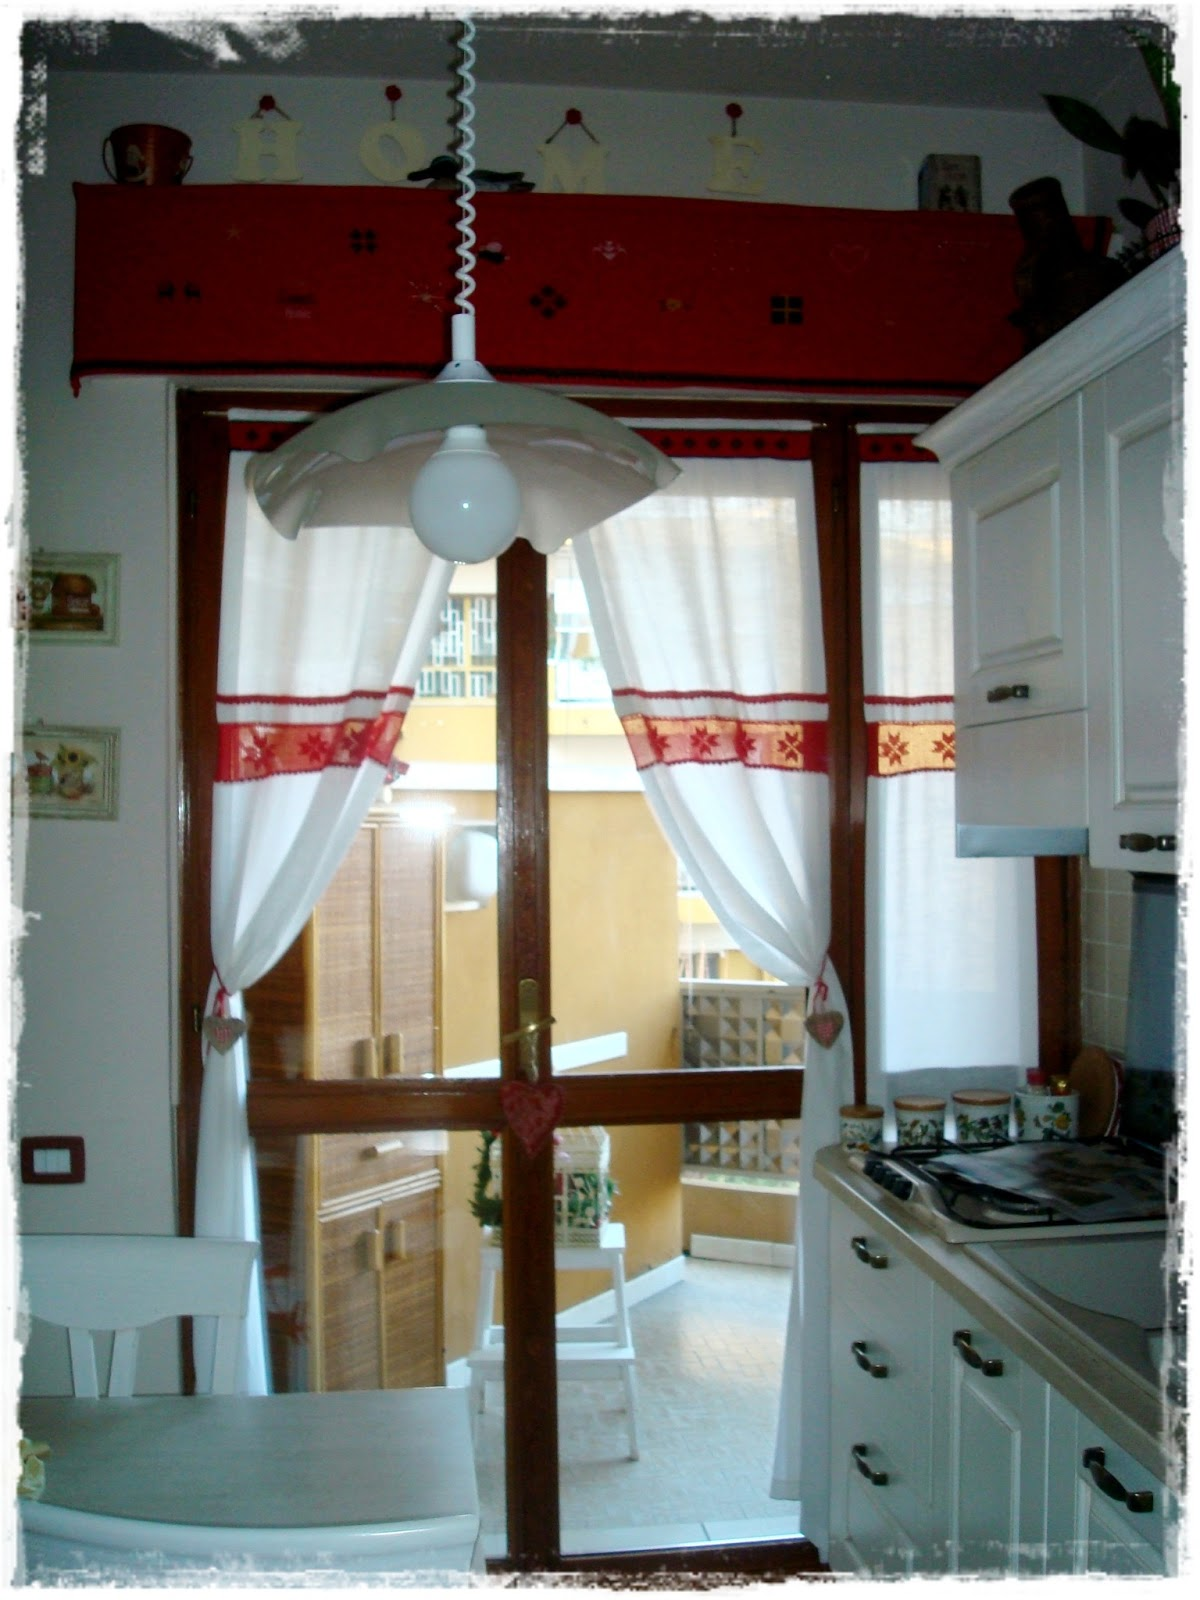 Shabby amelia le tende natalizie in cucina ricamo e uncinetto - Tende in cucina ...